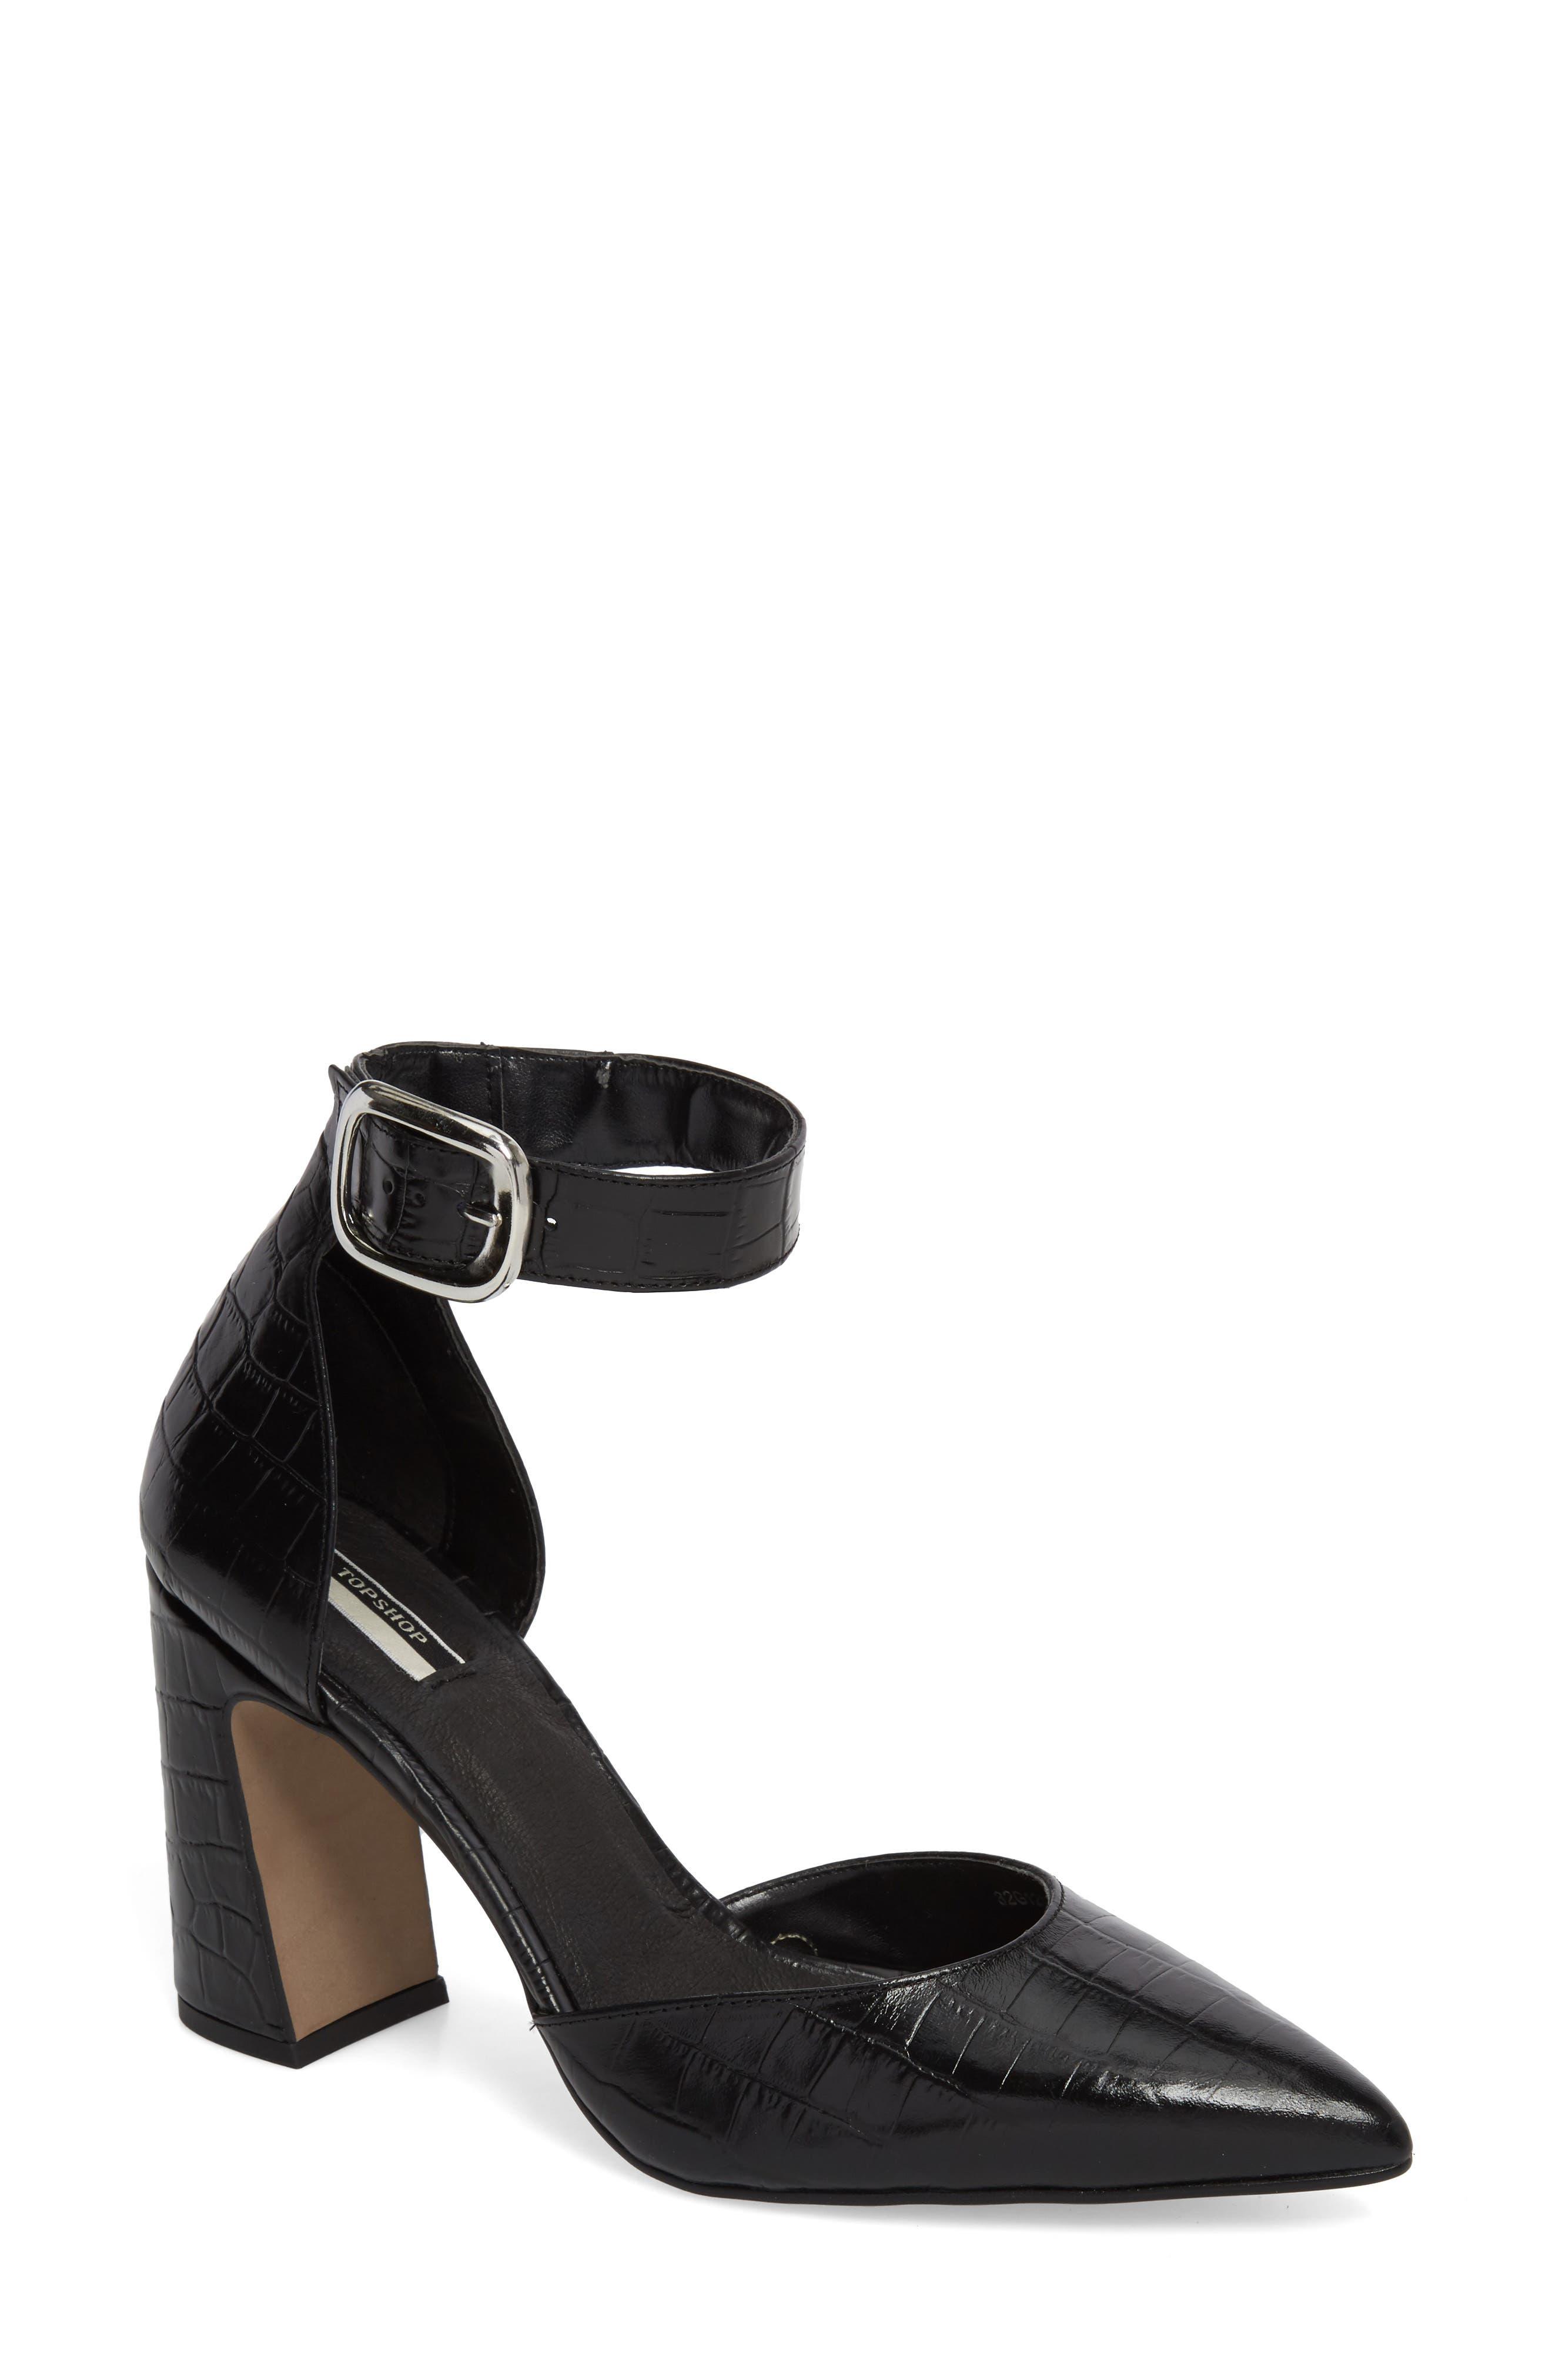 Geisha Ankle Strap Pump,                         Main,                         color, Black